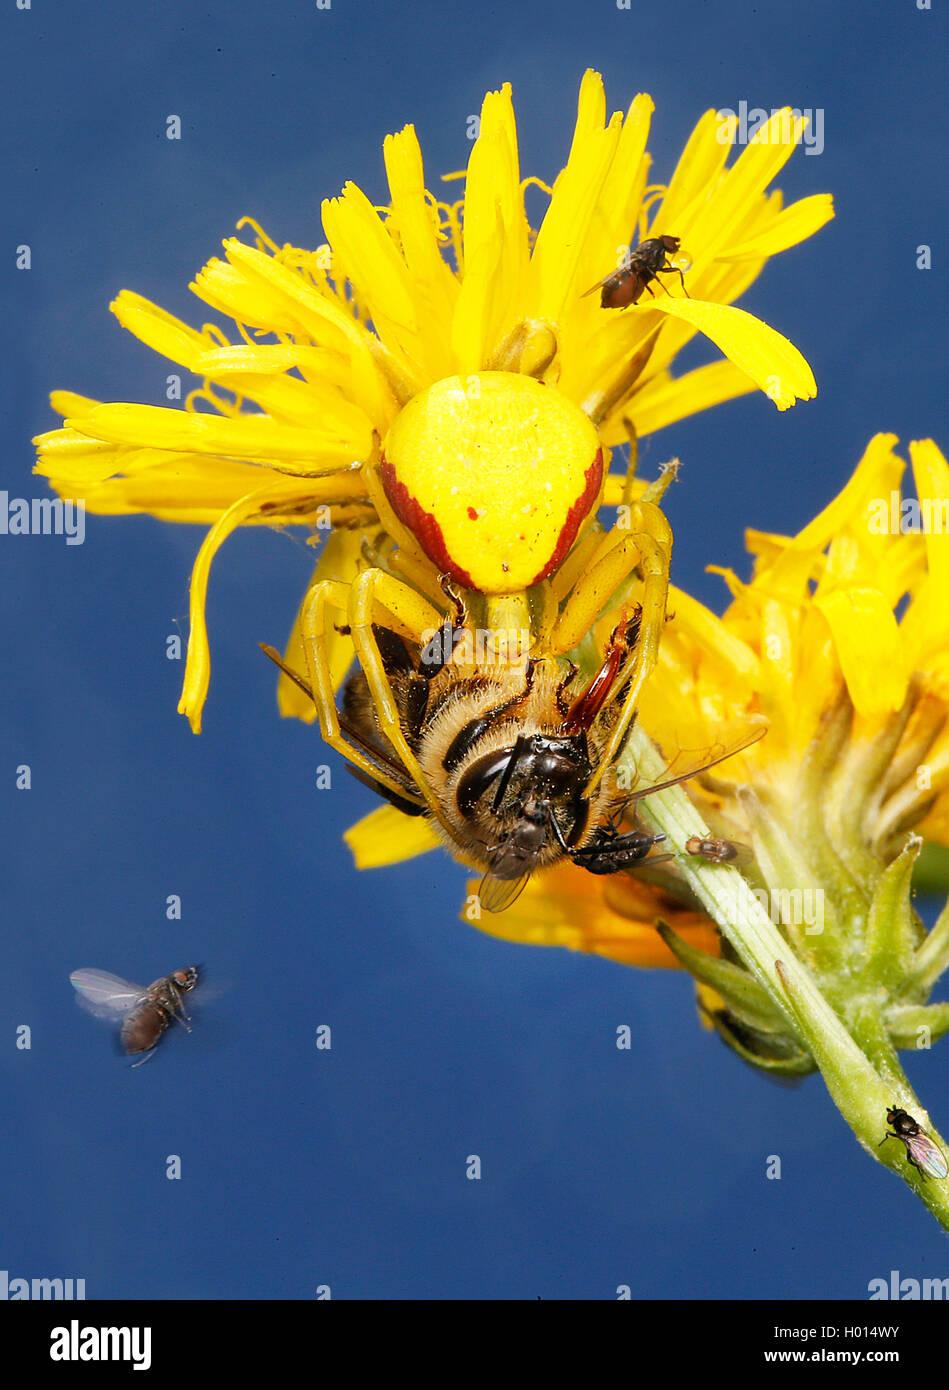 goldenrod crab spider (Misumena vatia), with prey on a yellow composite, Austria Stock Photo